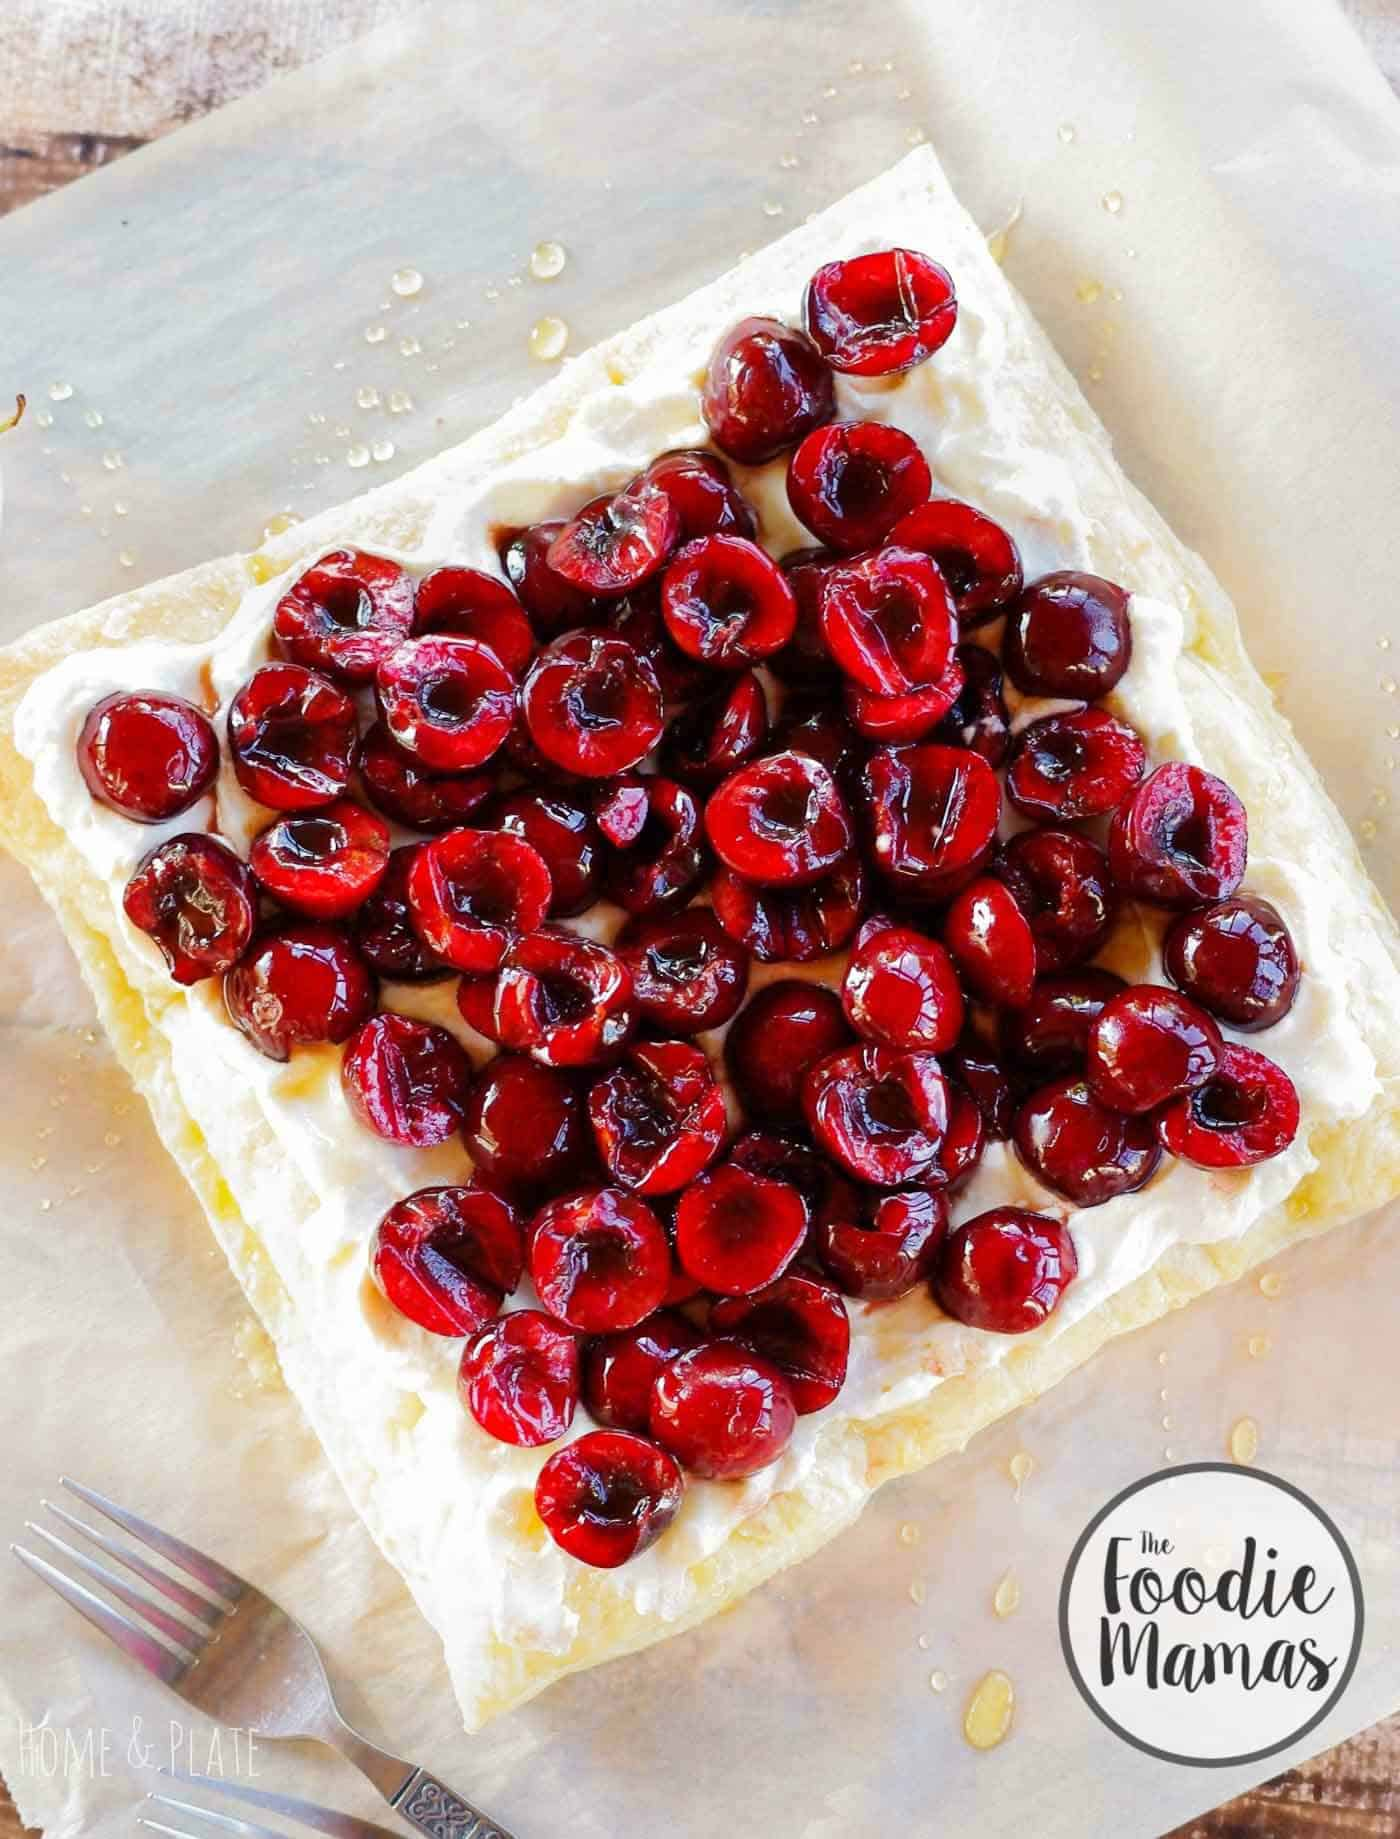 Cherry honey ricotta tart + 10 amazing holiday dessert recipes! Amazing holiday dessert recipes from your favorite food bloggers, The Foodie Mamas!